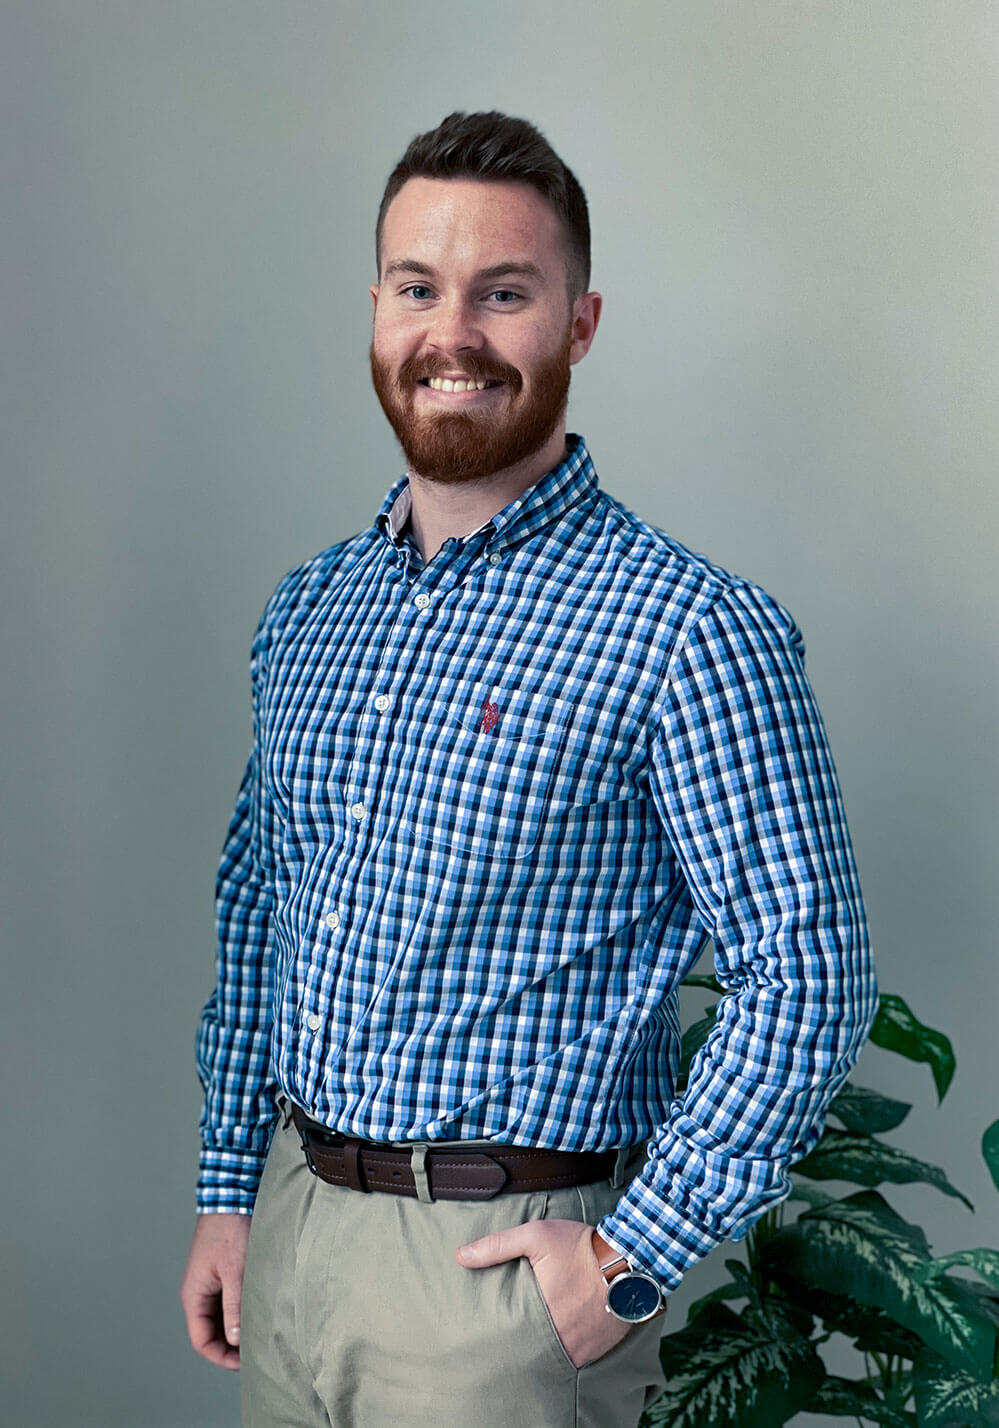 Levi Greenly, CFA Level 2 Candidate's profile image